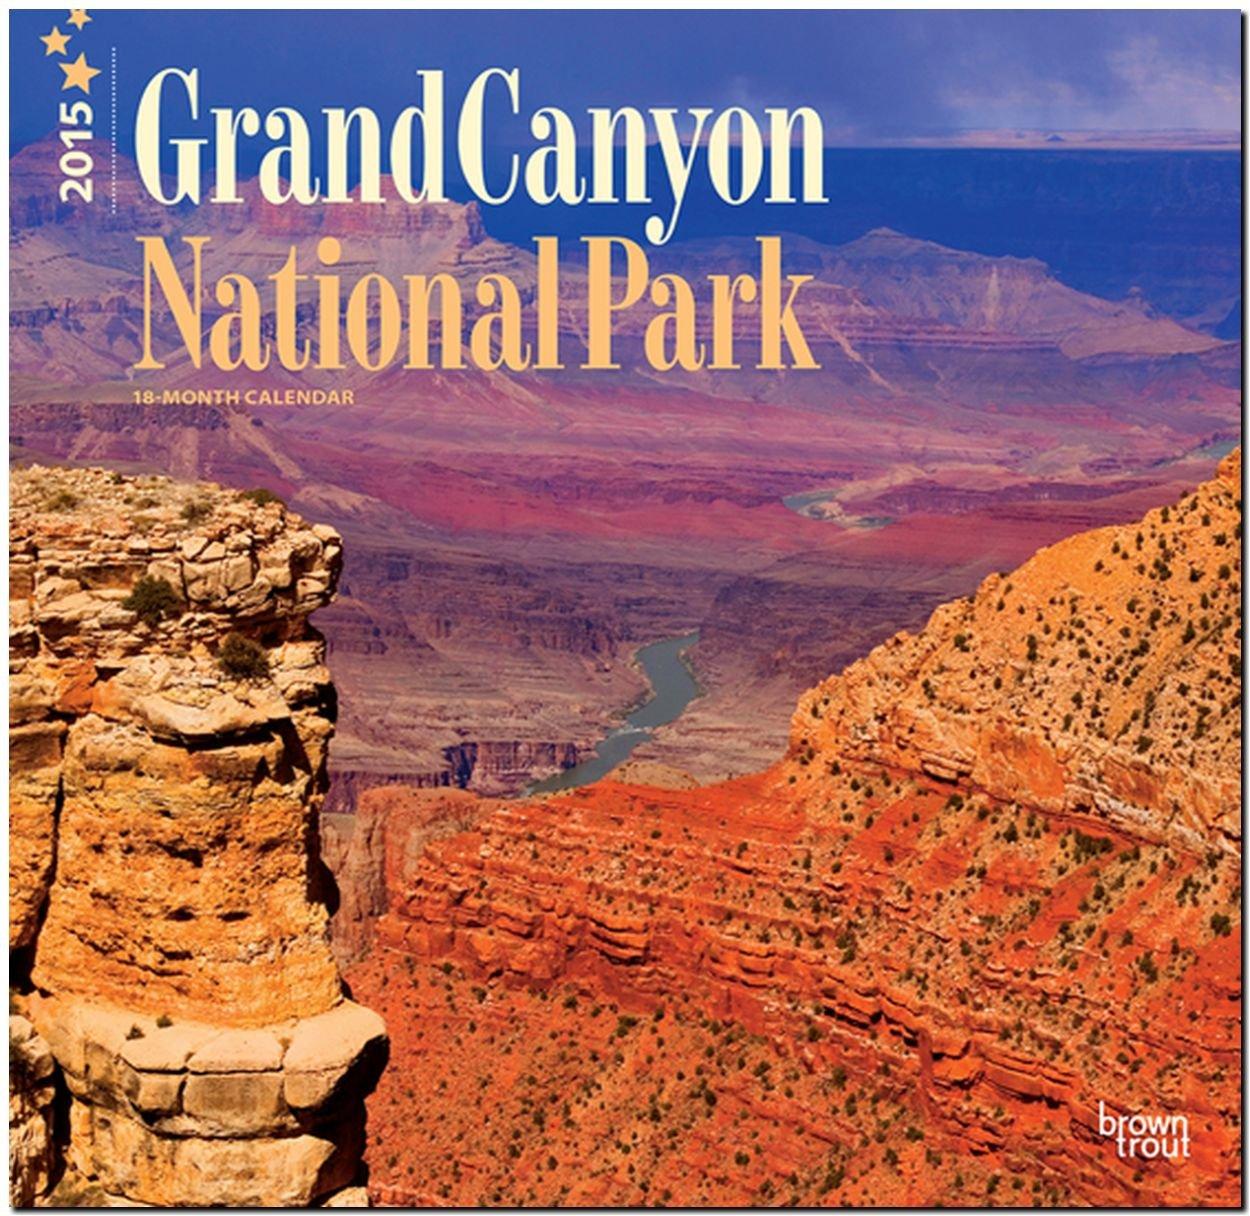 Grand Canyon National Park 2015: Original BrownTrout-Kalender [Mehrsprachig] [Kalender]